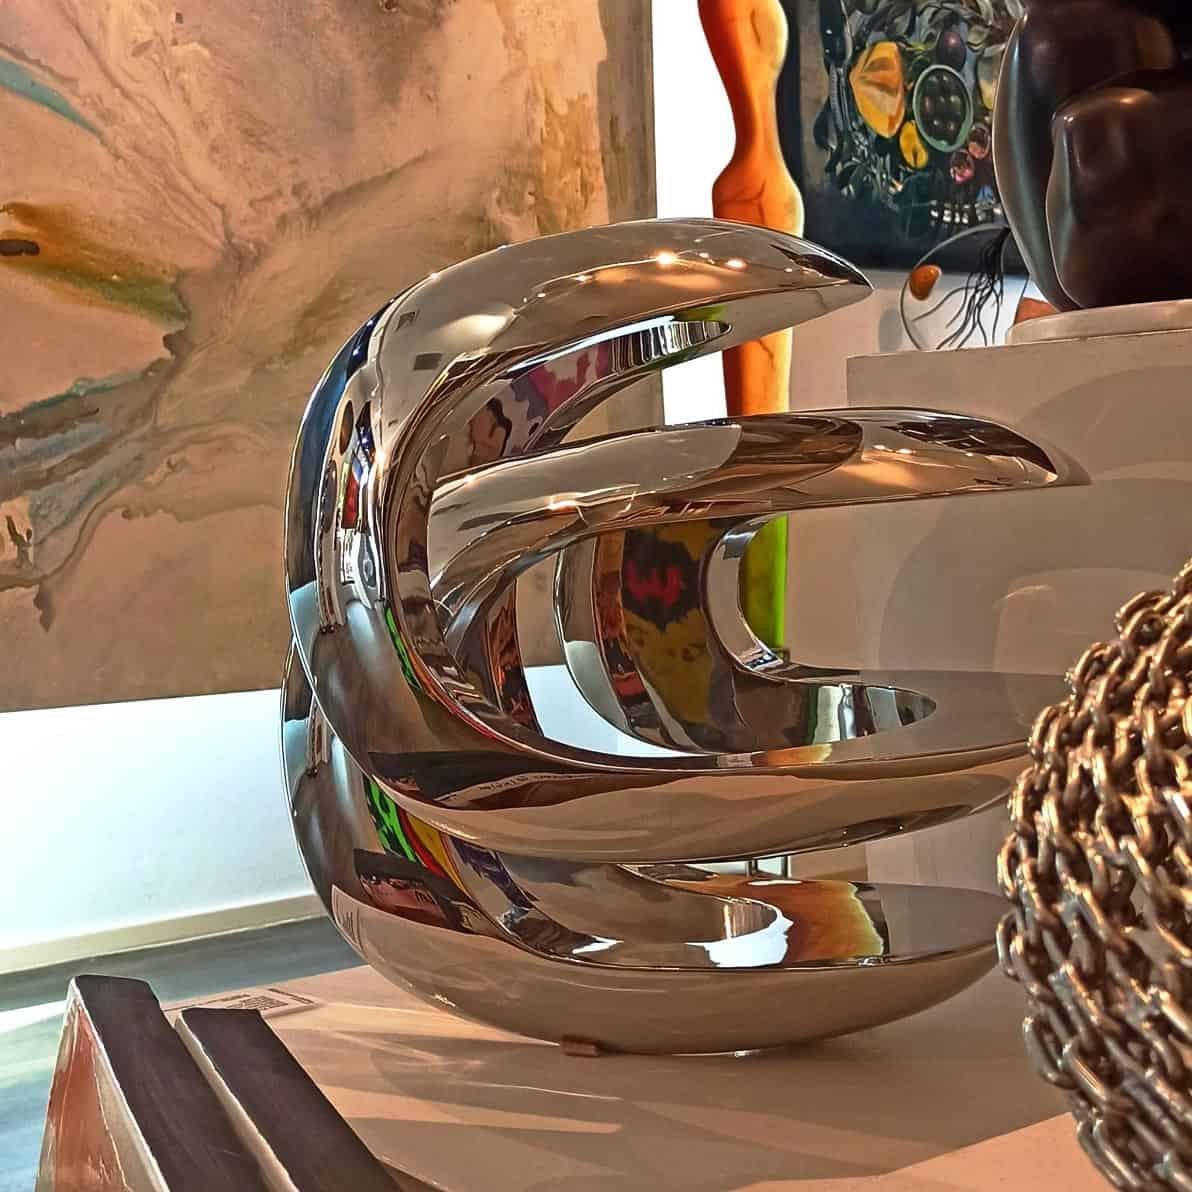 Intersecting-Envelope-40x40cm-POLISHED-StainlessSTEEL[Table-top,-Stainless-steel]blazeski-australian-abstract-sculpture-spherical-art